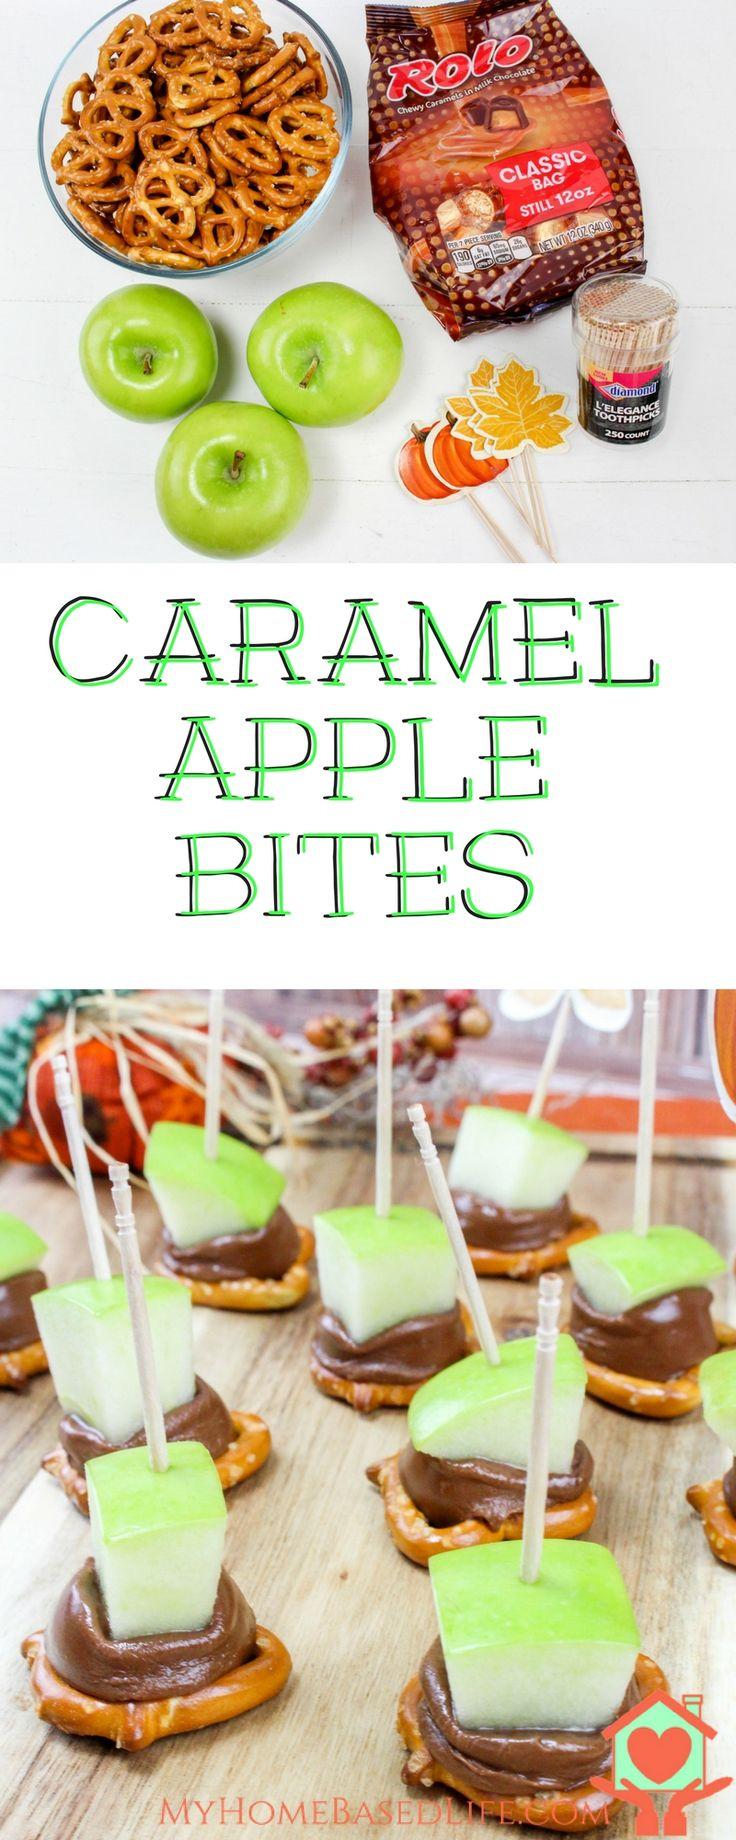 Caramel Apple Bites. The Perfect Apple Season Fall Snack! Caramel Apple Bites | Apple Desserts | DIY Caramel Apples | Mini Caramel Apples | Caramel Apple Recipe | Fall Apple Recipe | Apple Recipe | via @myhomebasedlife